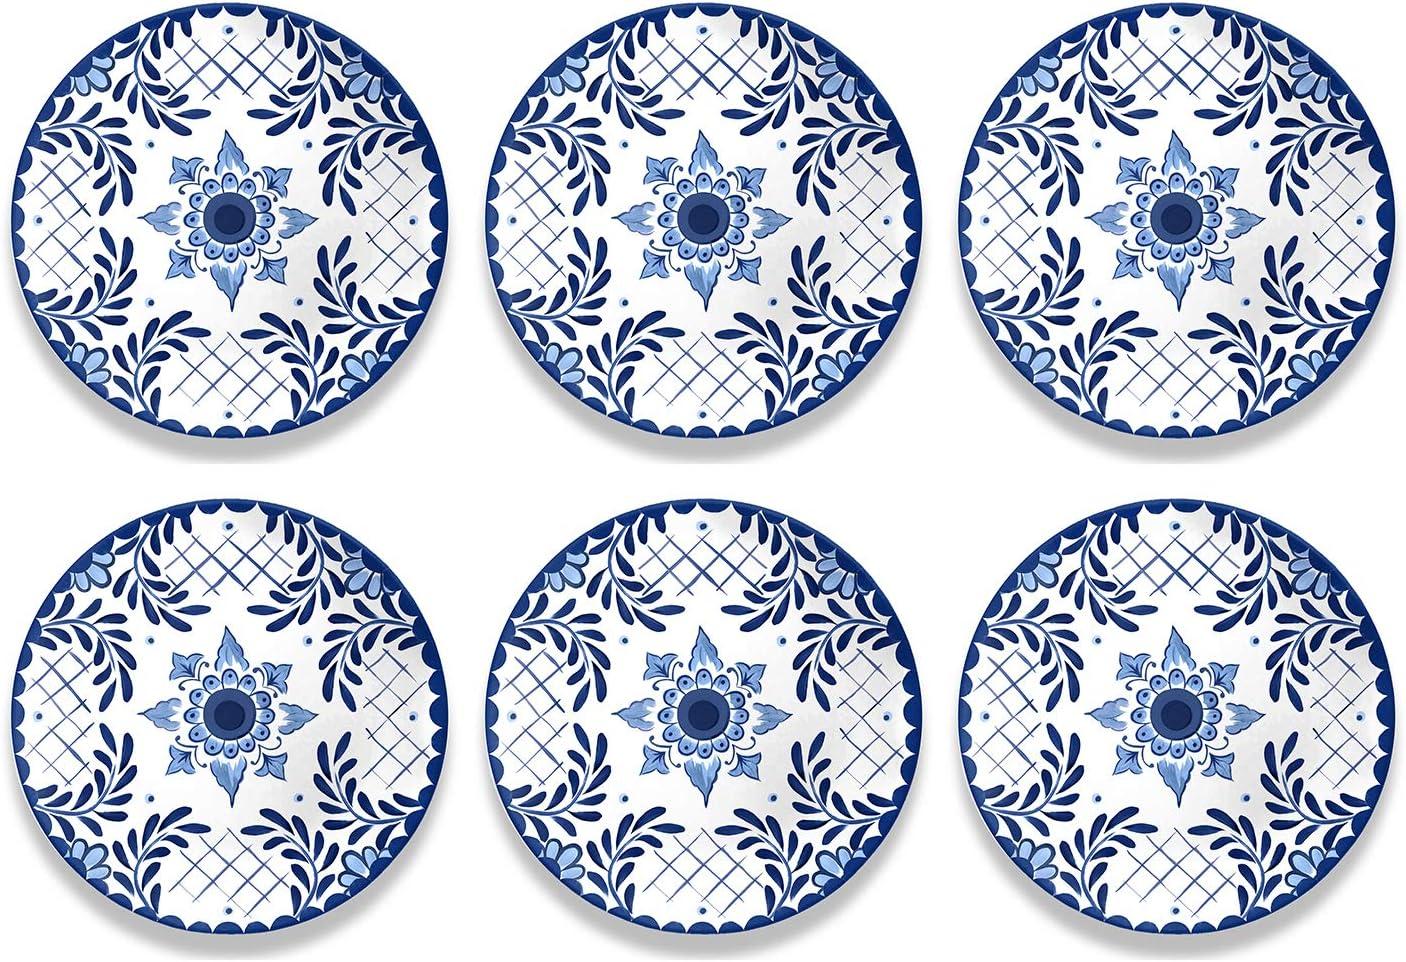 "TRF1105TDPCC - Set of 6 - Cobalt Casita - Melamine Dinner Plate - 10.5"" by TarHong"